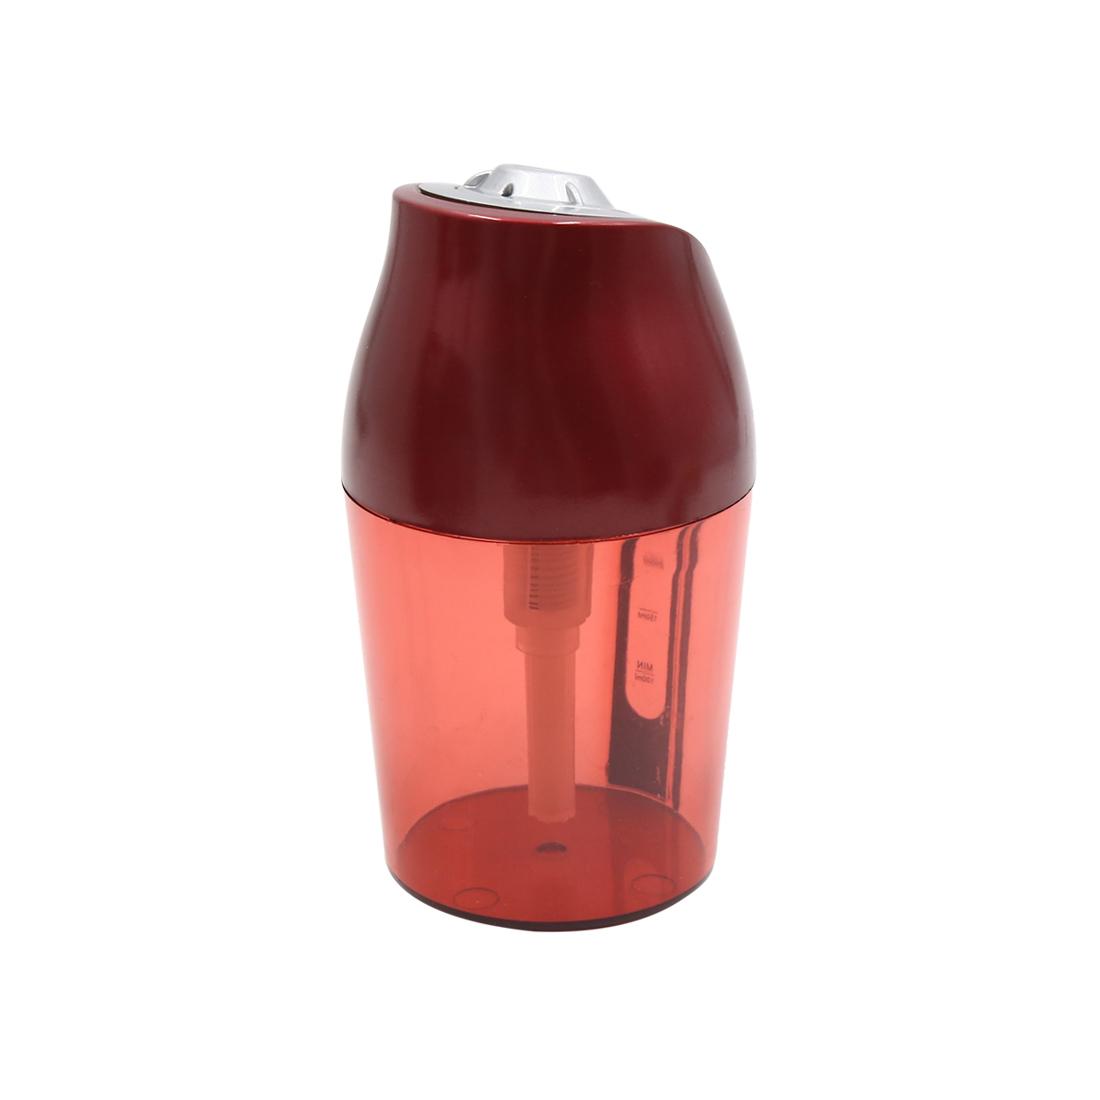 Red Mini Ultrasonic Car Air Mist Purifier Humidifier Diffuser 5V 250ml 0.2W - image 1 de 4